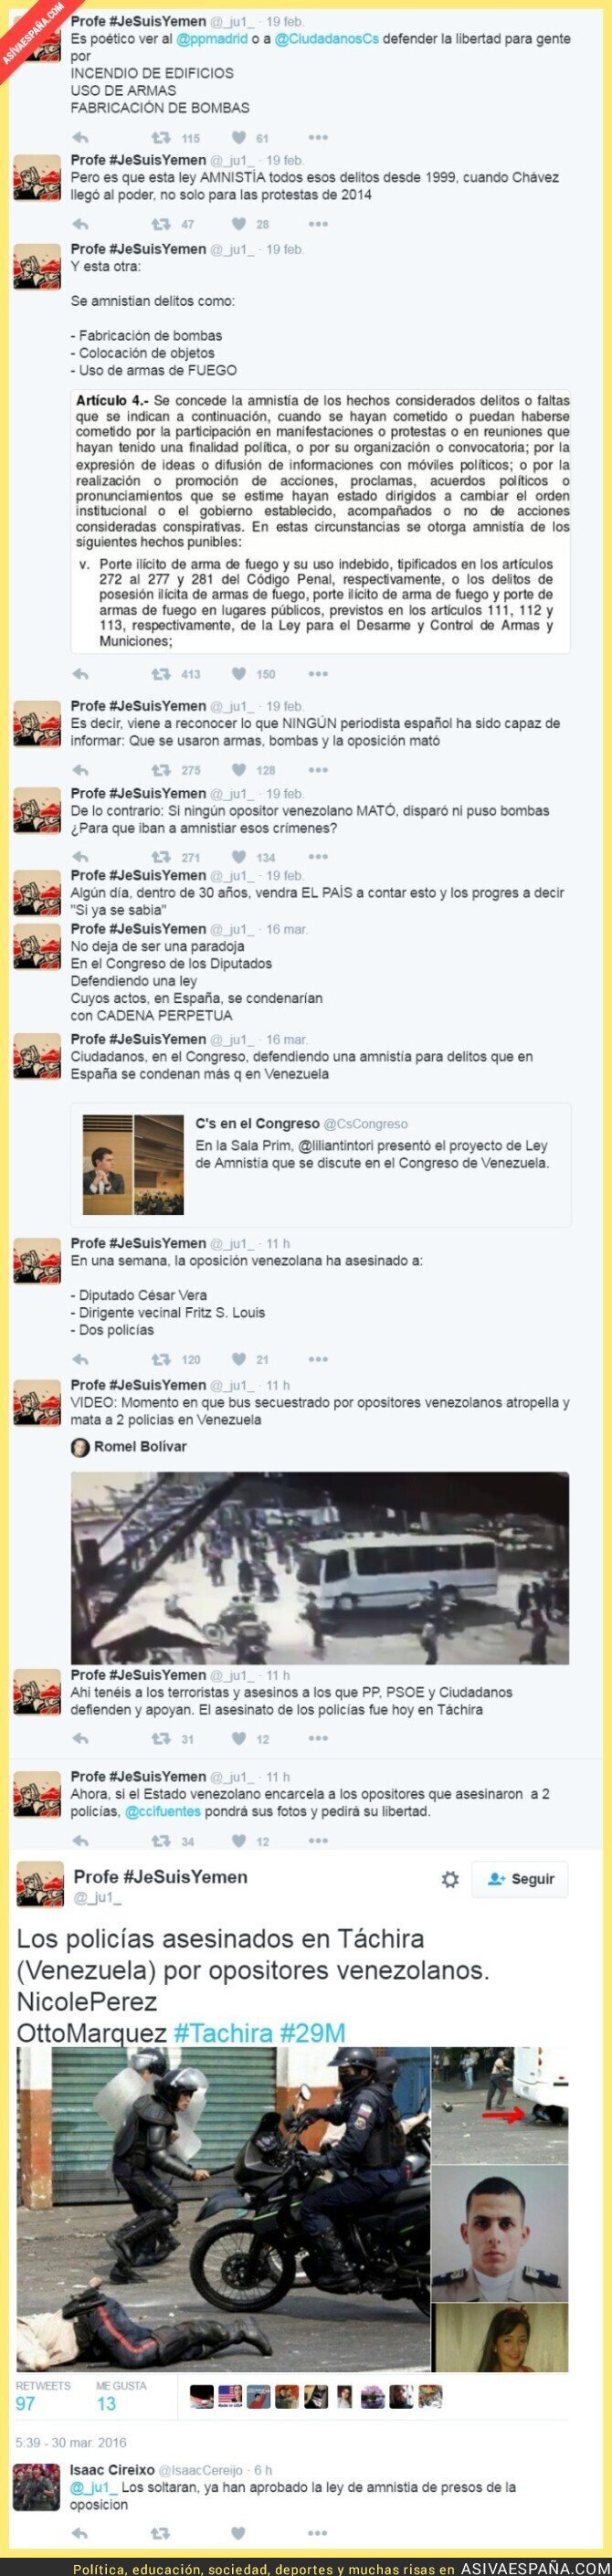 38456 - Los 2 asesinos serán mostrados como presos políticos en breves en España